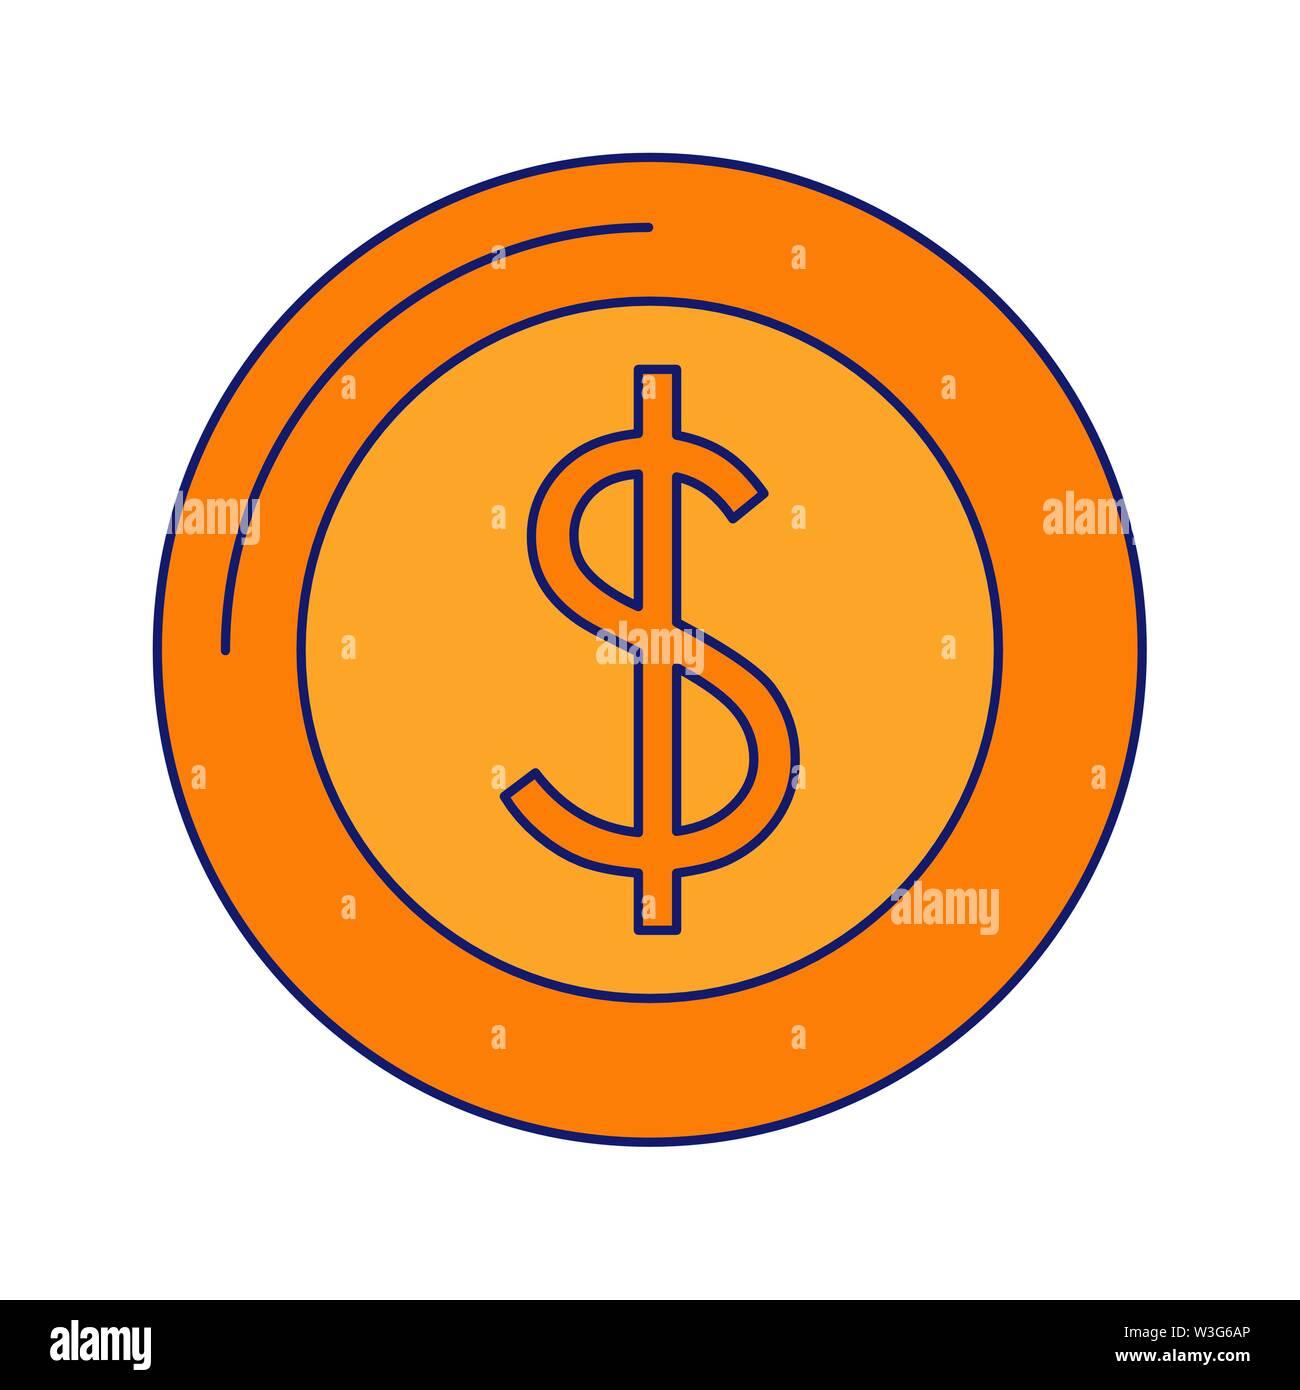 Geld sparen cash Münze cartoon Vector Illustration graphic design Stockbild